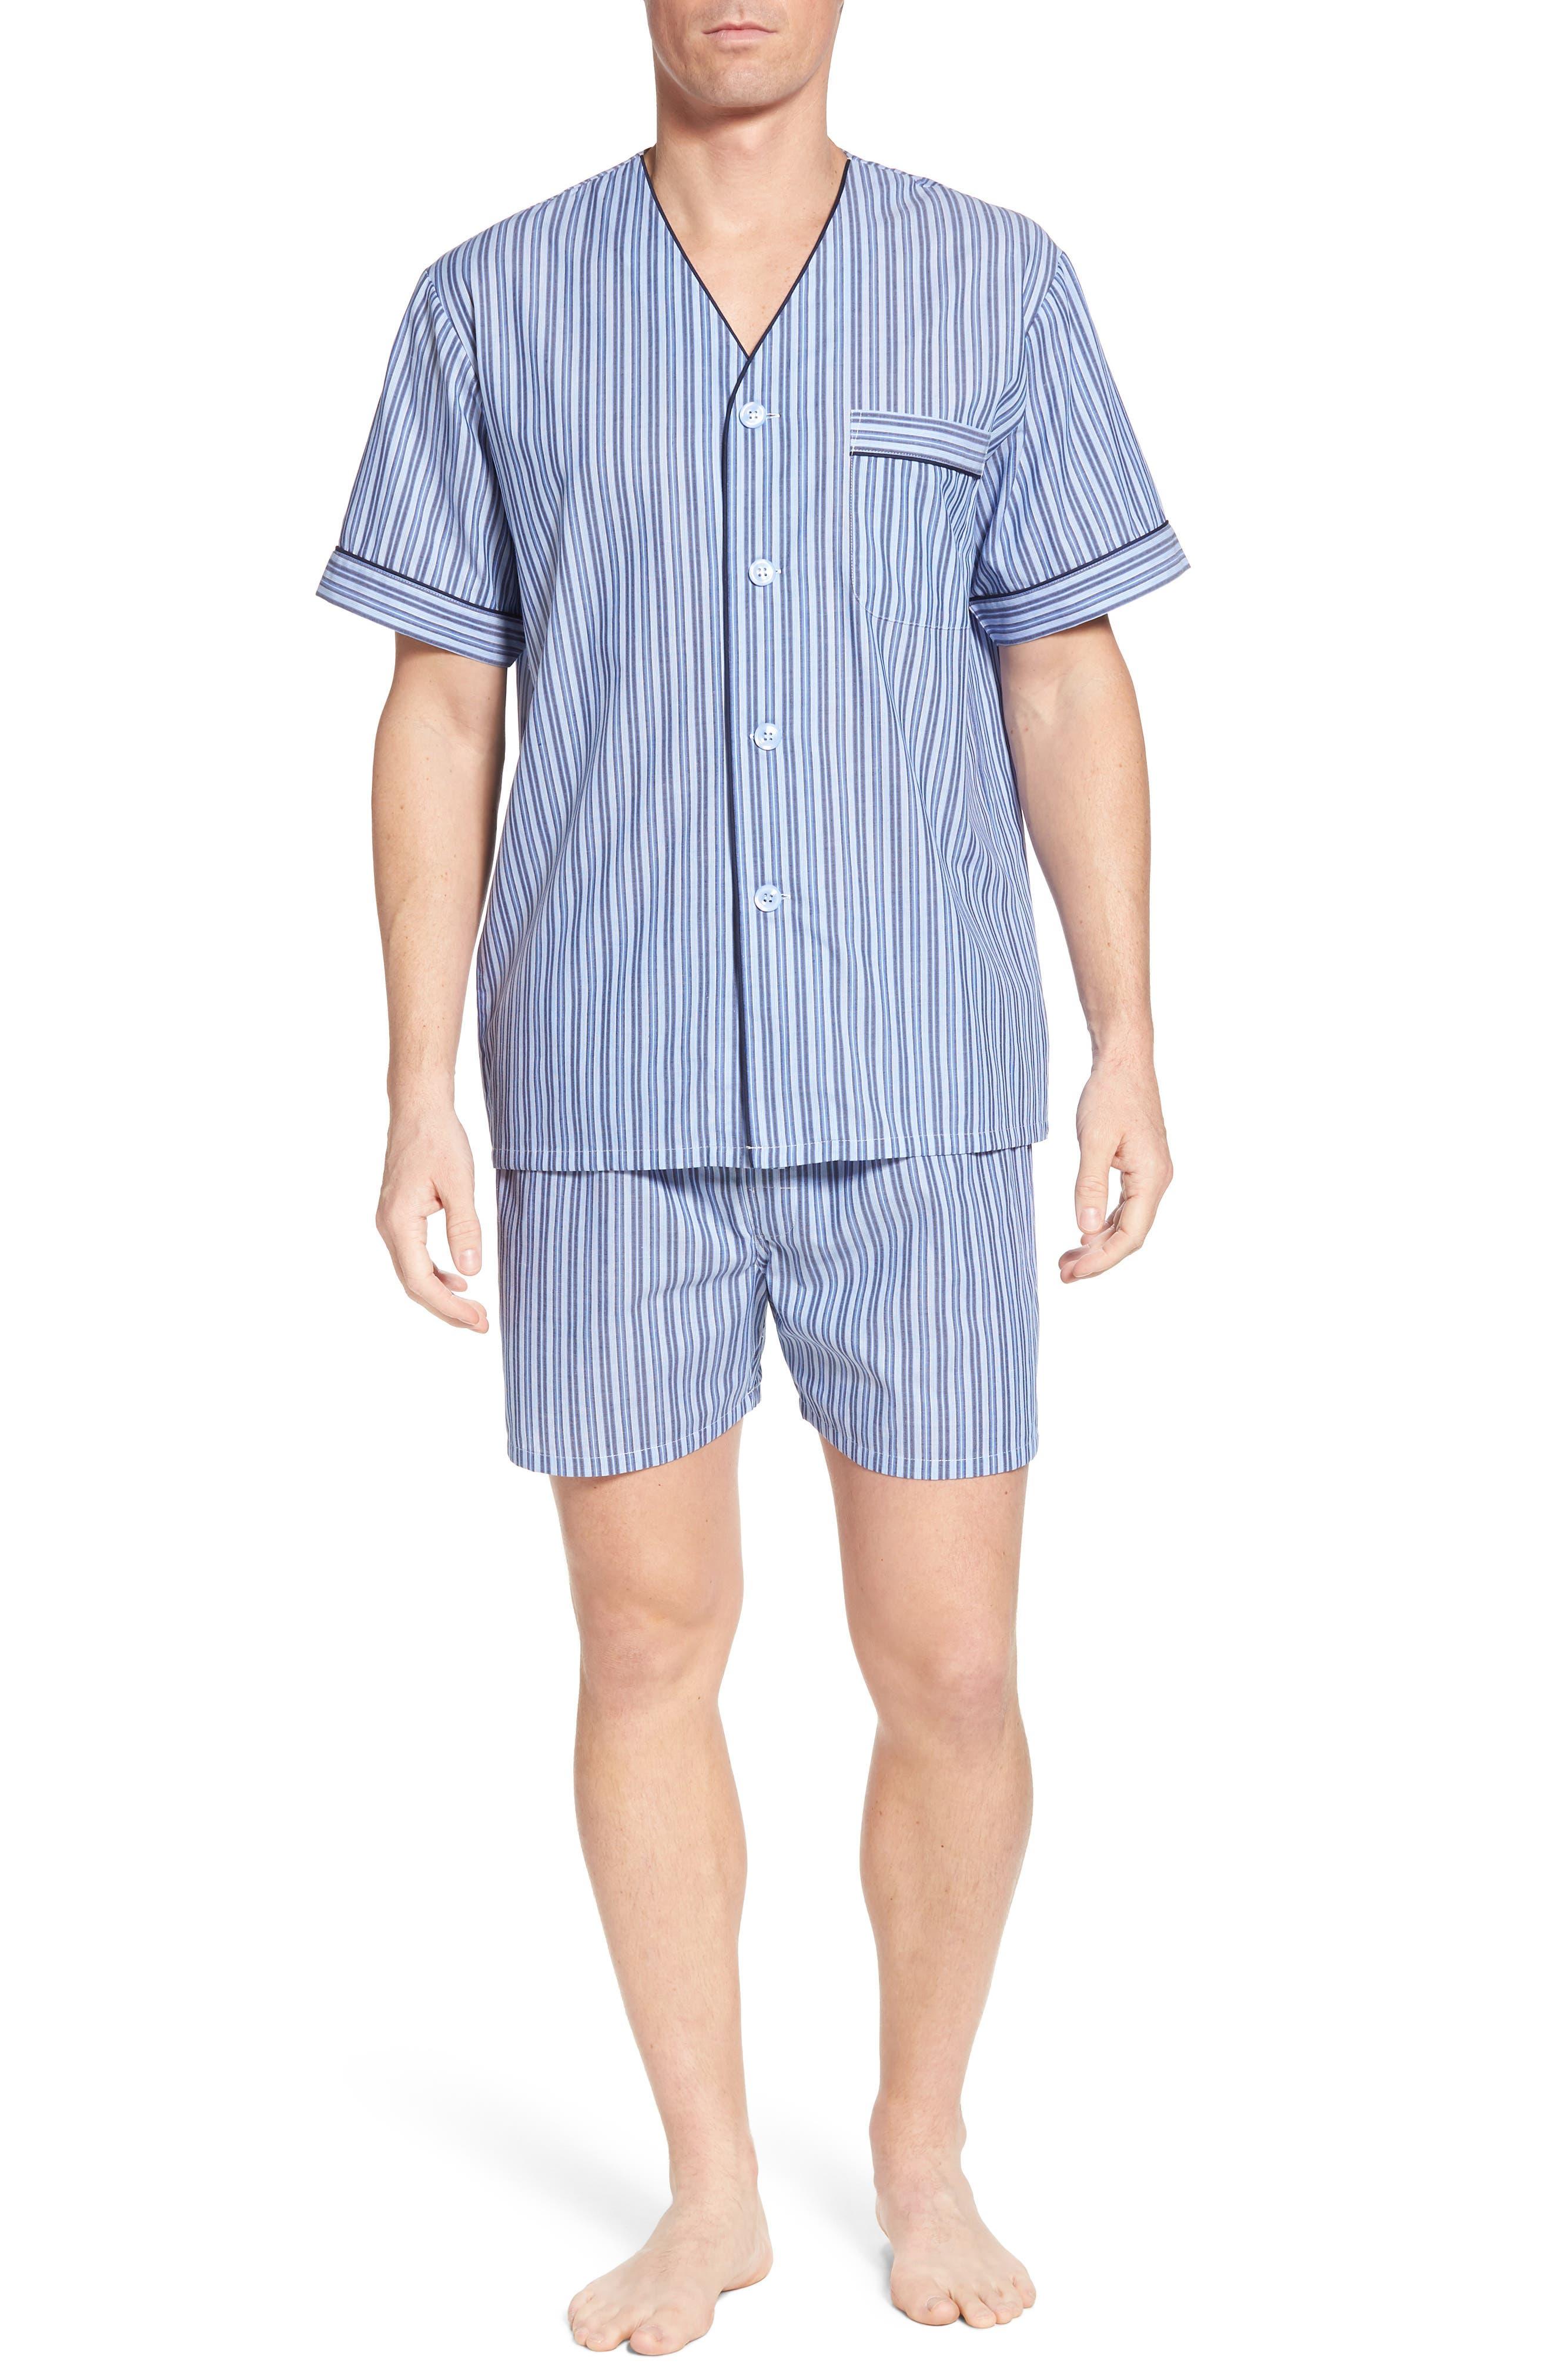 Carefree Shorty Pajama Set,                         Main,                         color, BLUE STRIPE